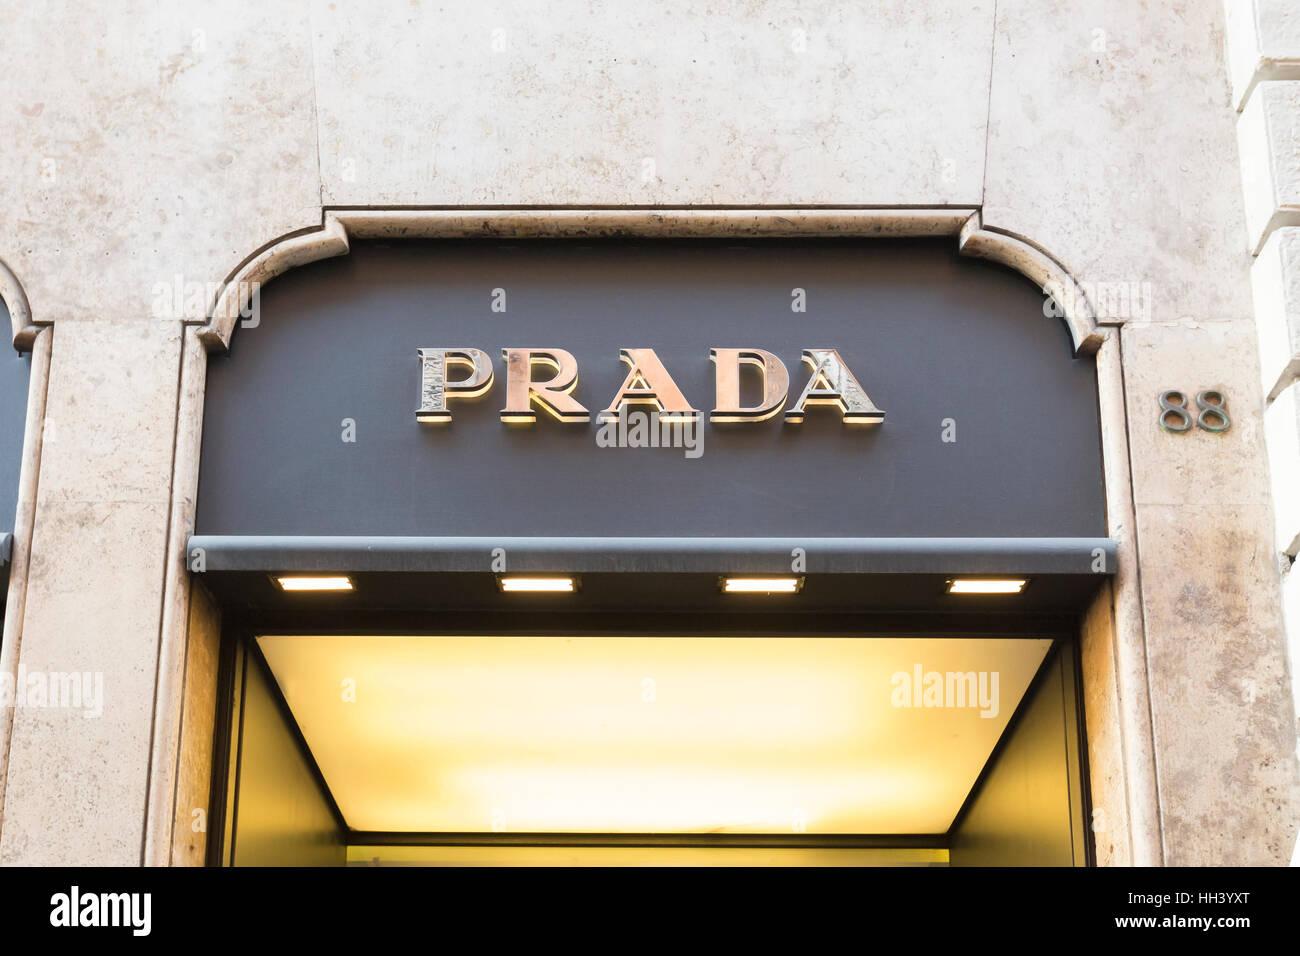 Prada shop Stock Photo